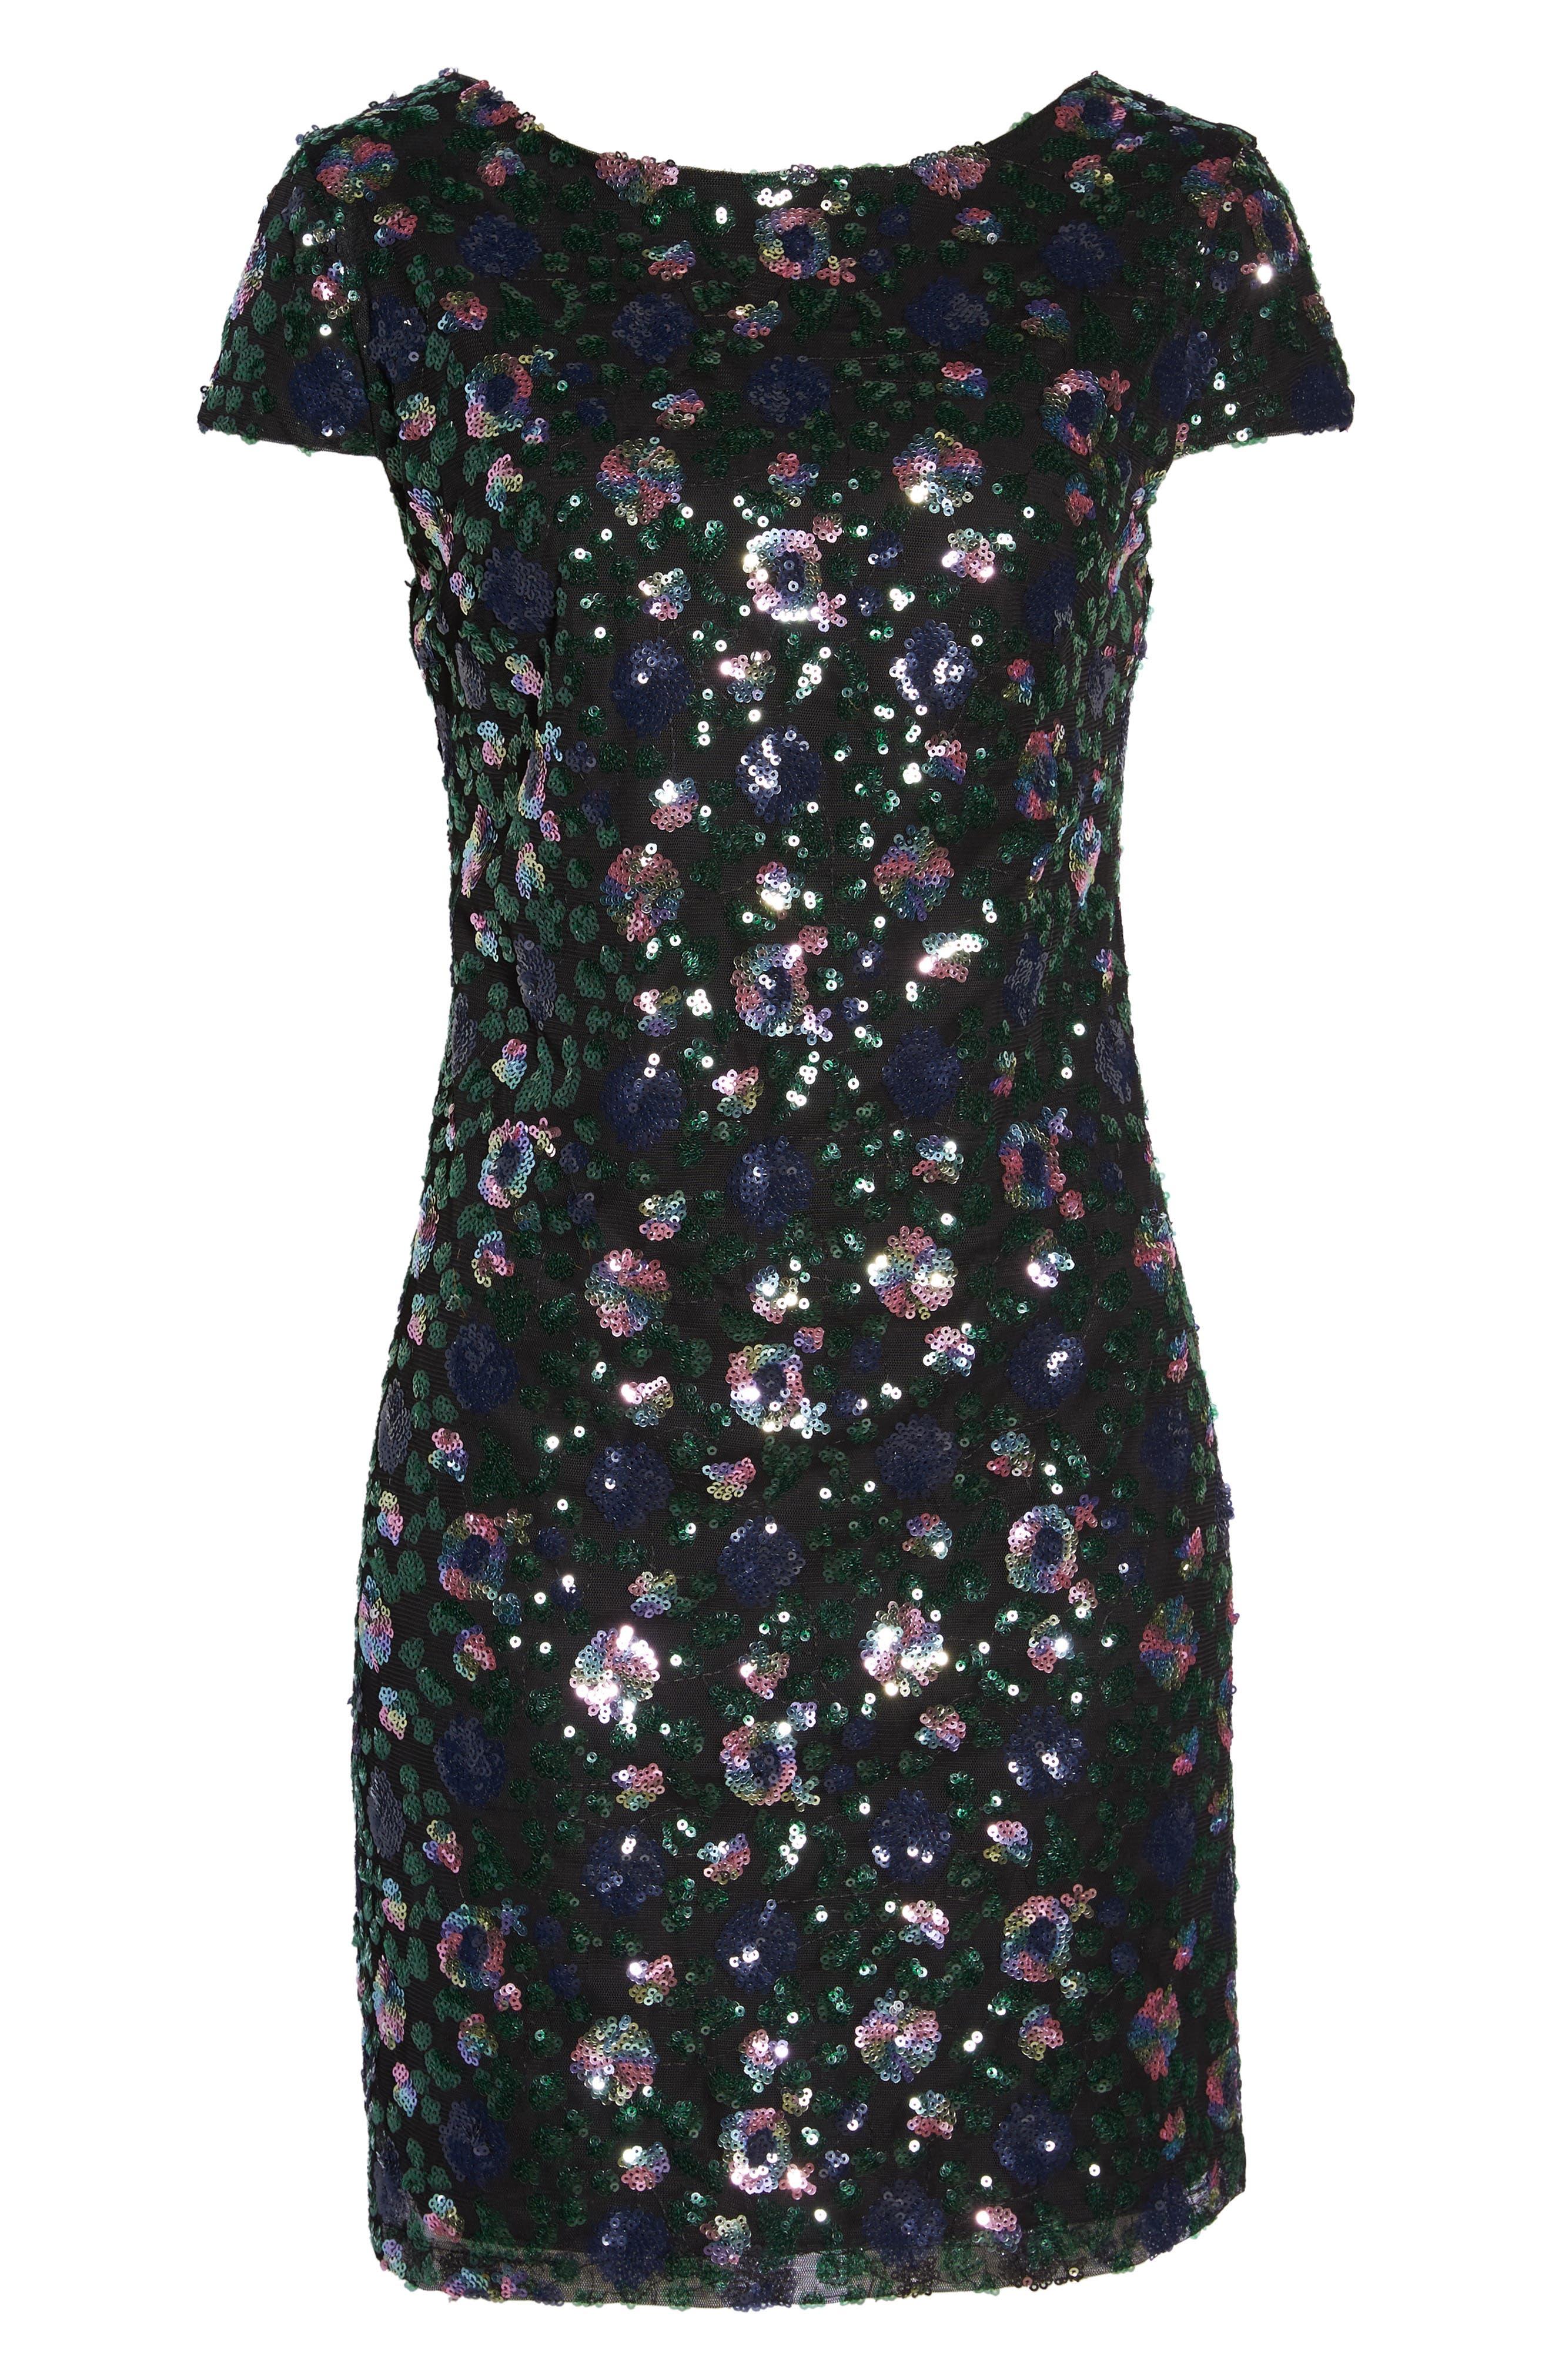 Floral Sequin Sheath Dress,                             Alternate thumbnail 6, color,                             PURPLE/ GREEN